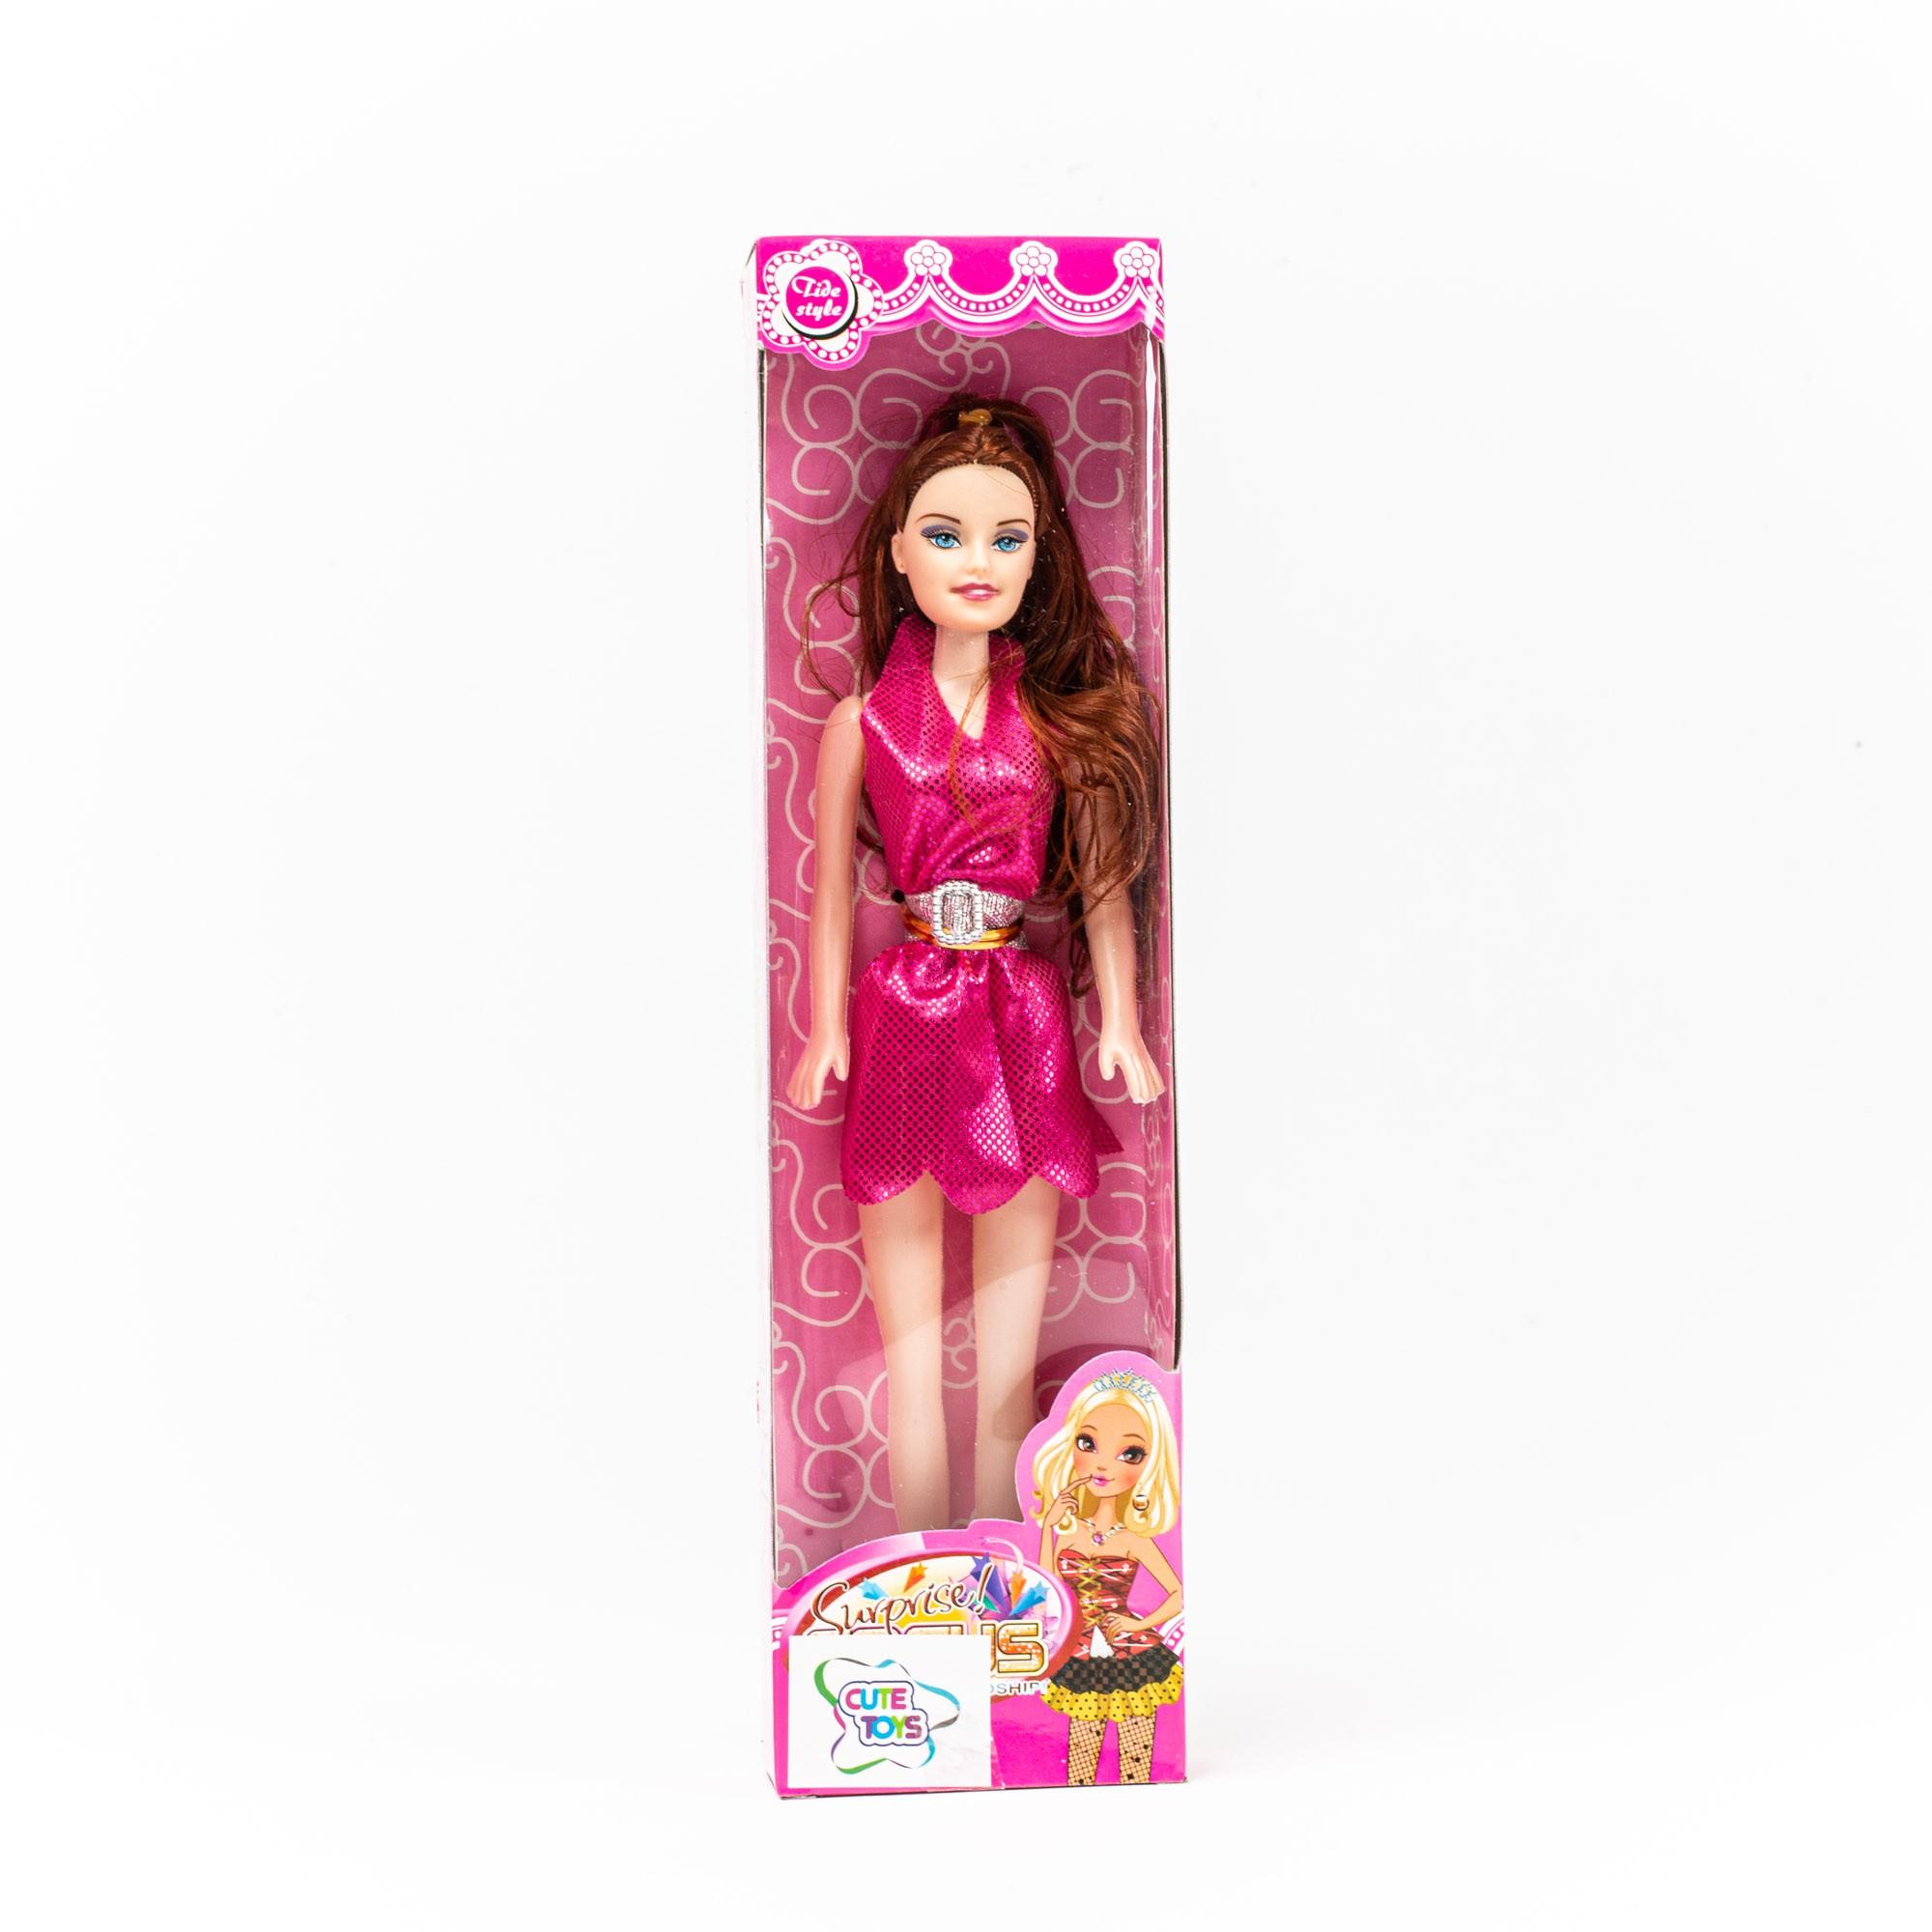 Boneca Morena Brinquedo